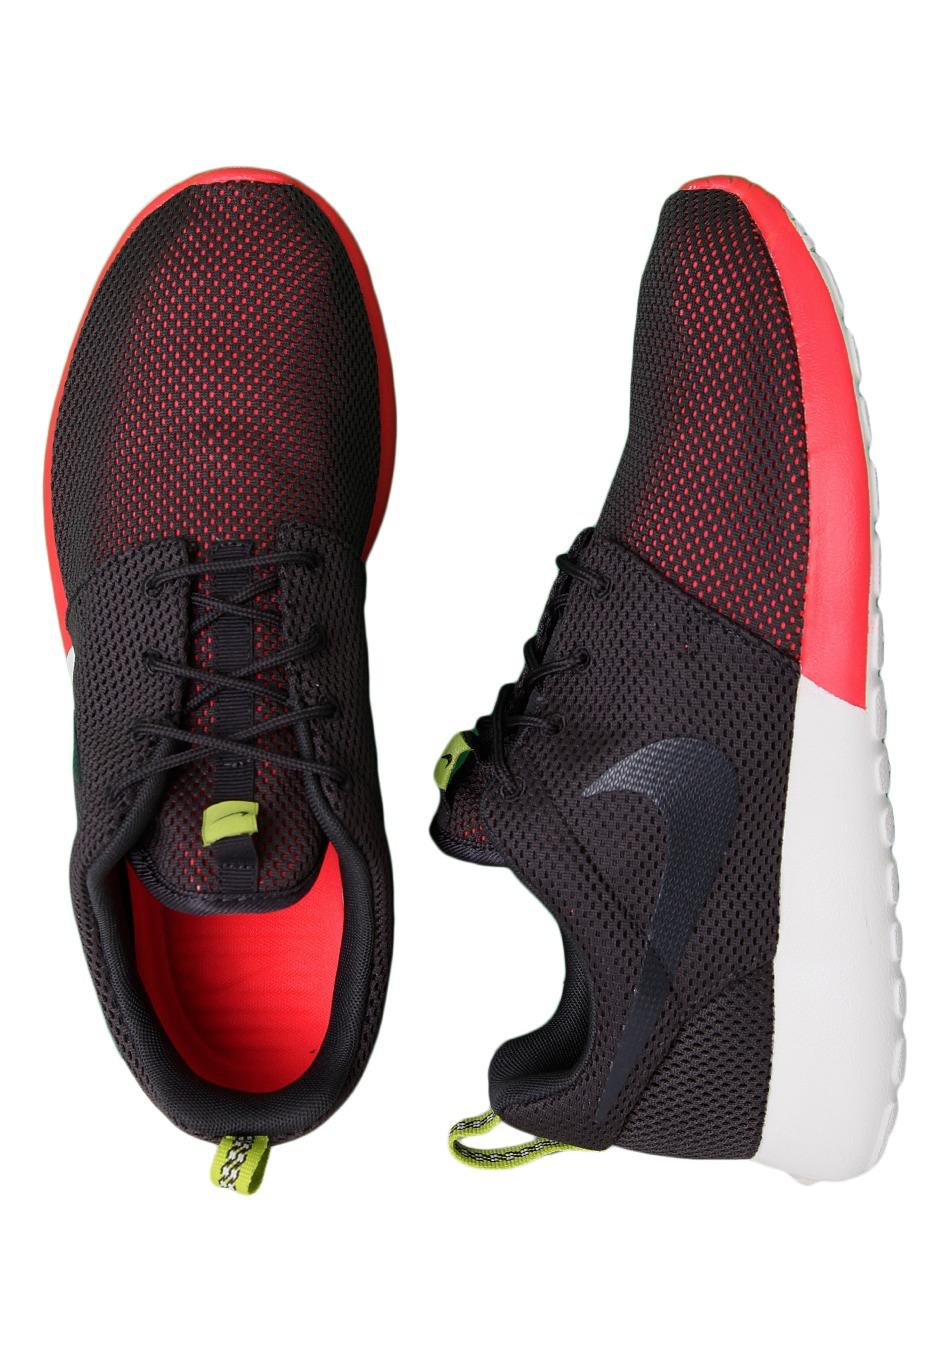 timeless design fd17b bf06d Nike - Roshe Run Anthracite Anthracite Venom Green Summit White - Shoes -  Impericon.com Worldwide